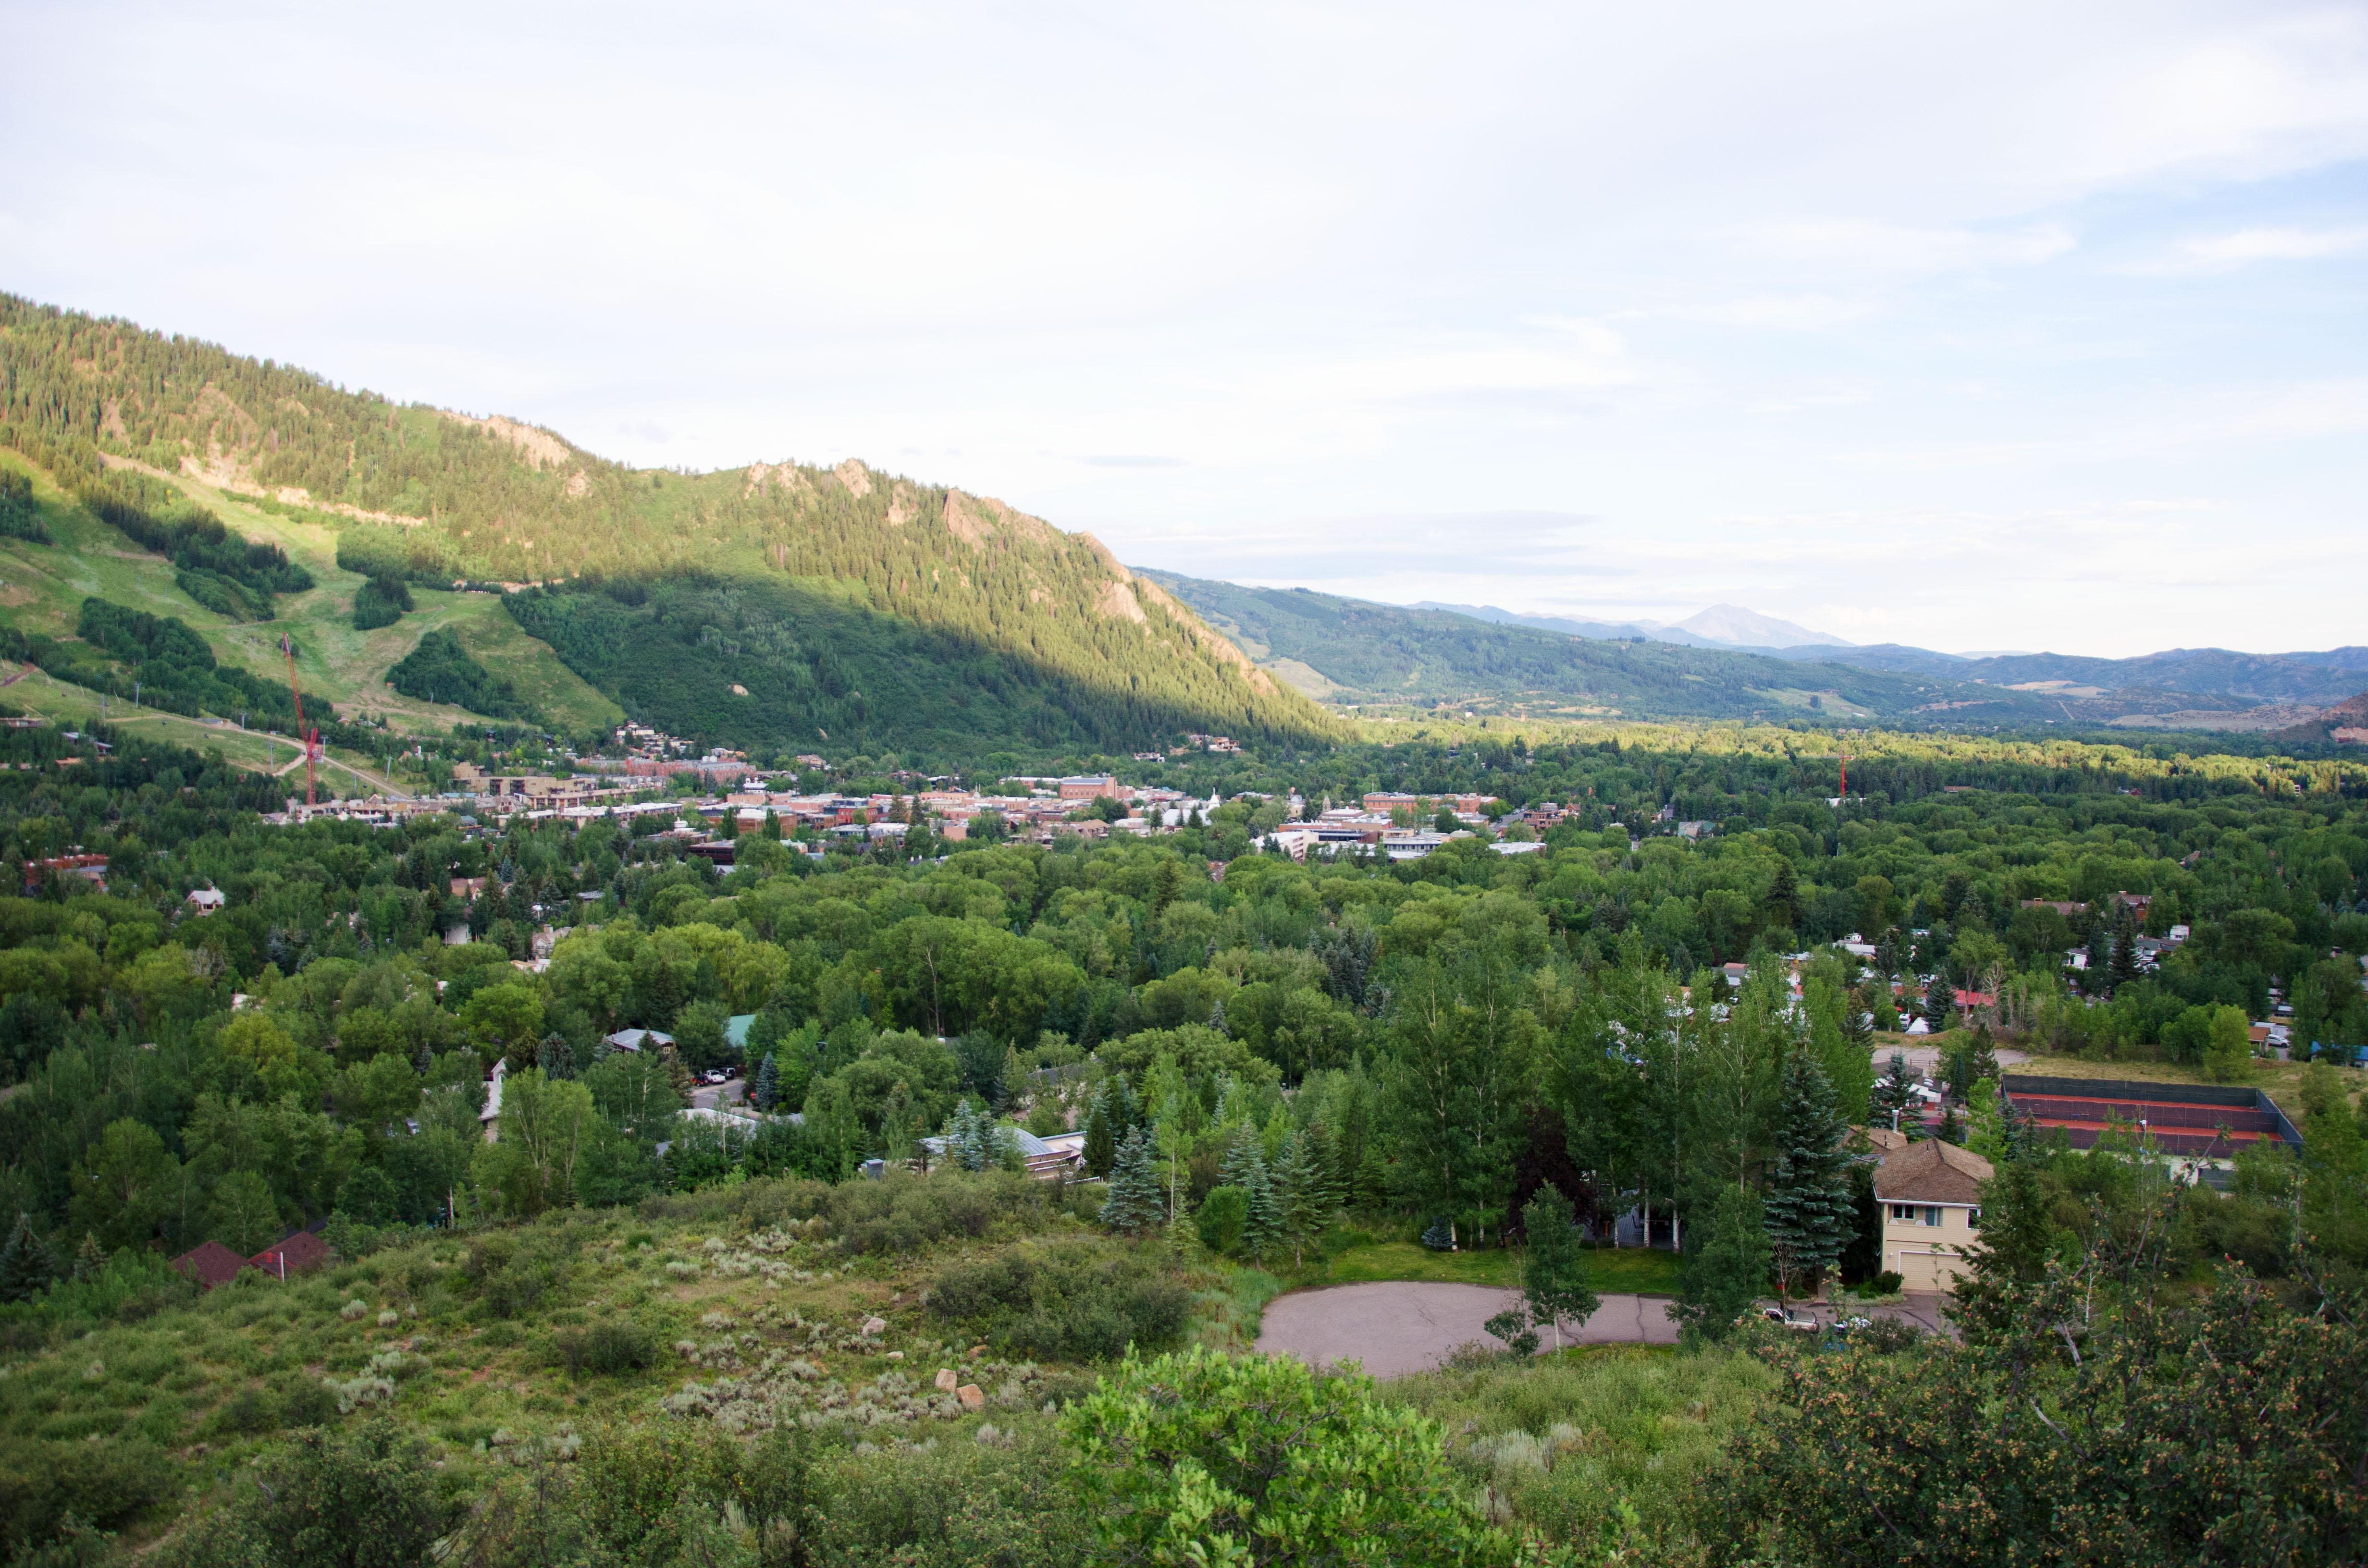 Town of Aspen